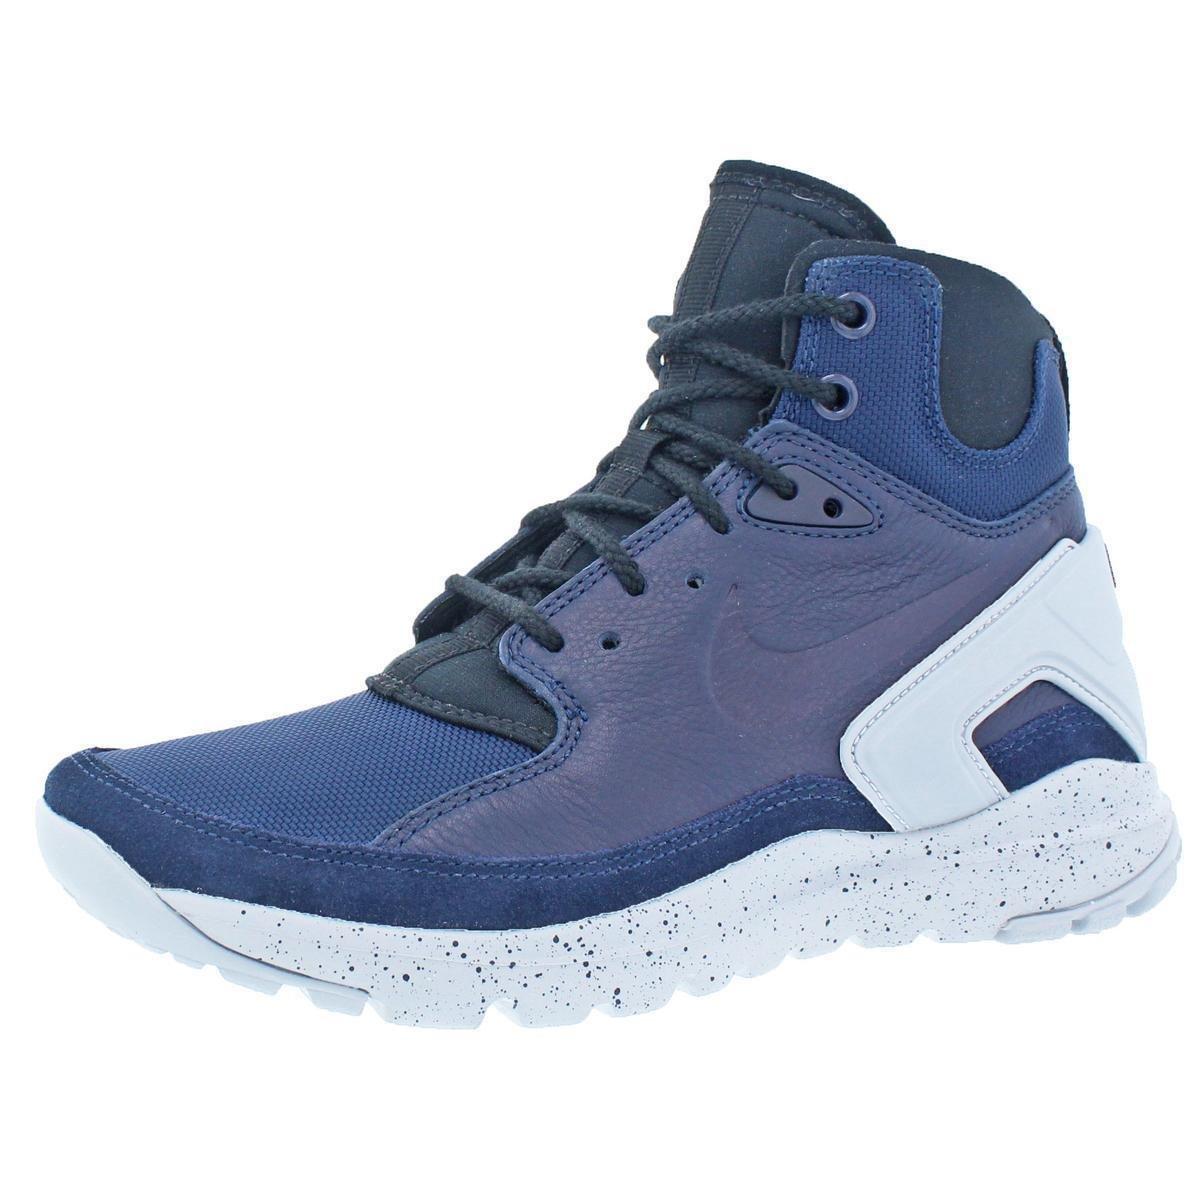 Nike Mens Koth Ultra Mid Navy Mid Casual Shoes Sneakers 6 Medium